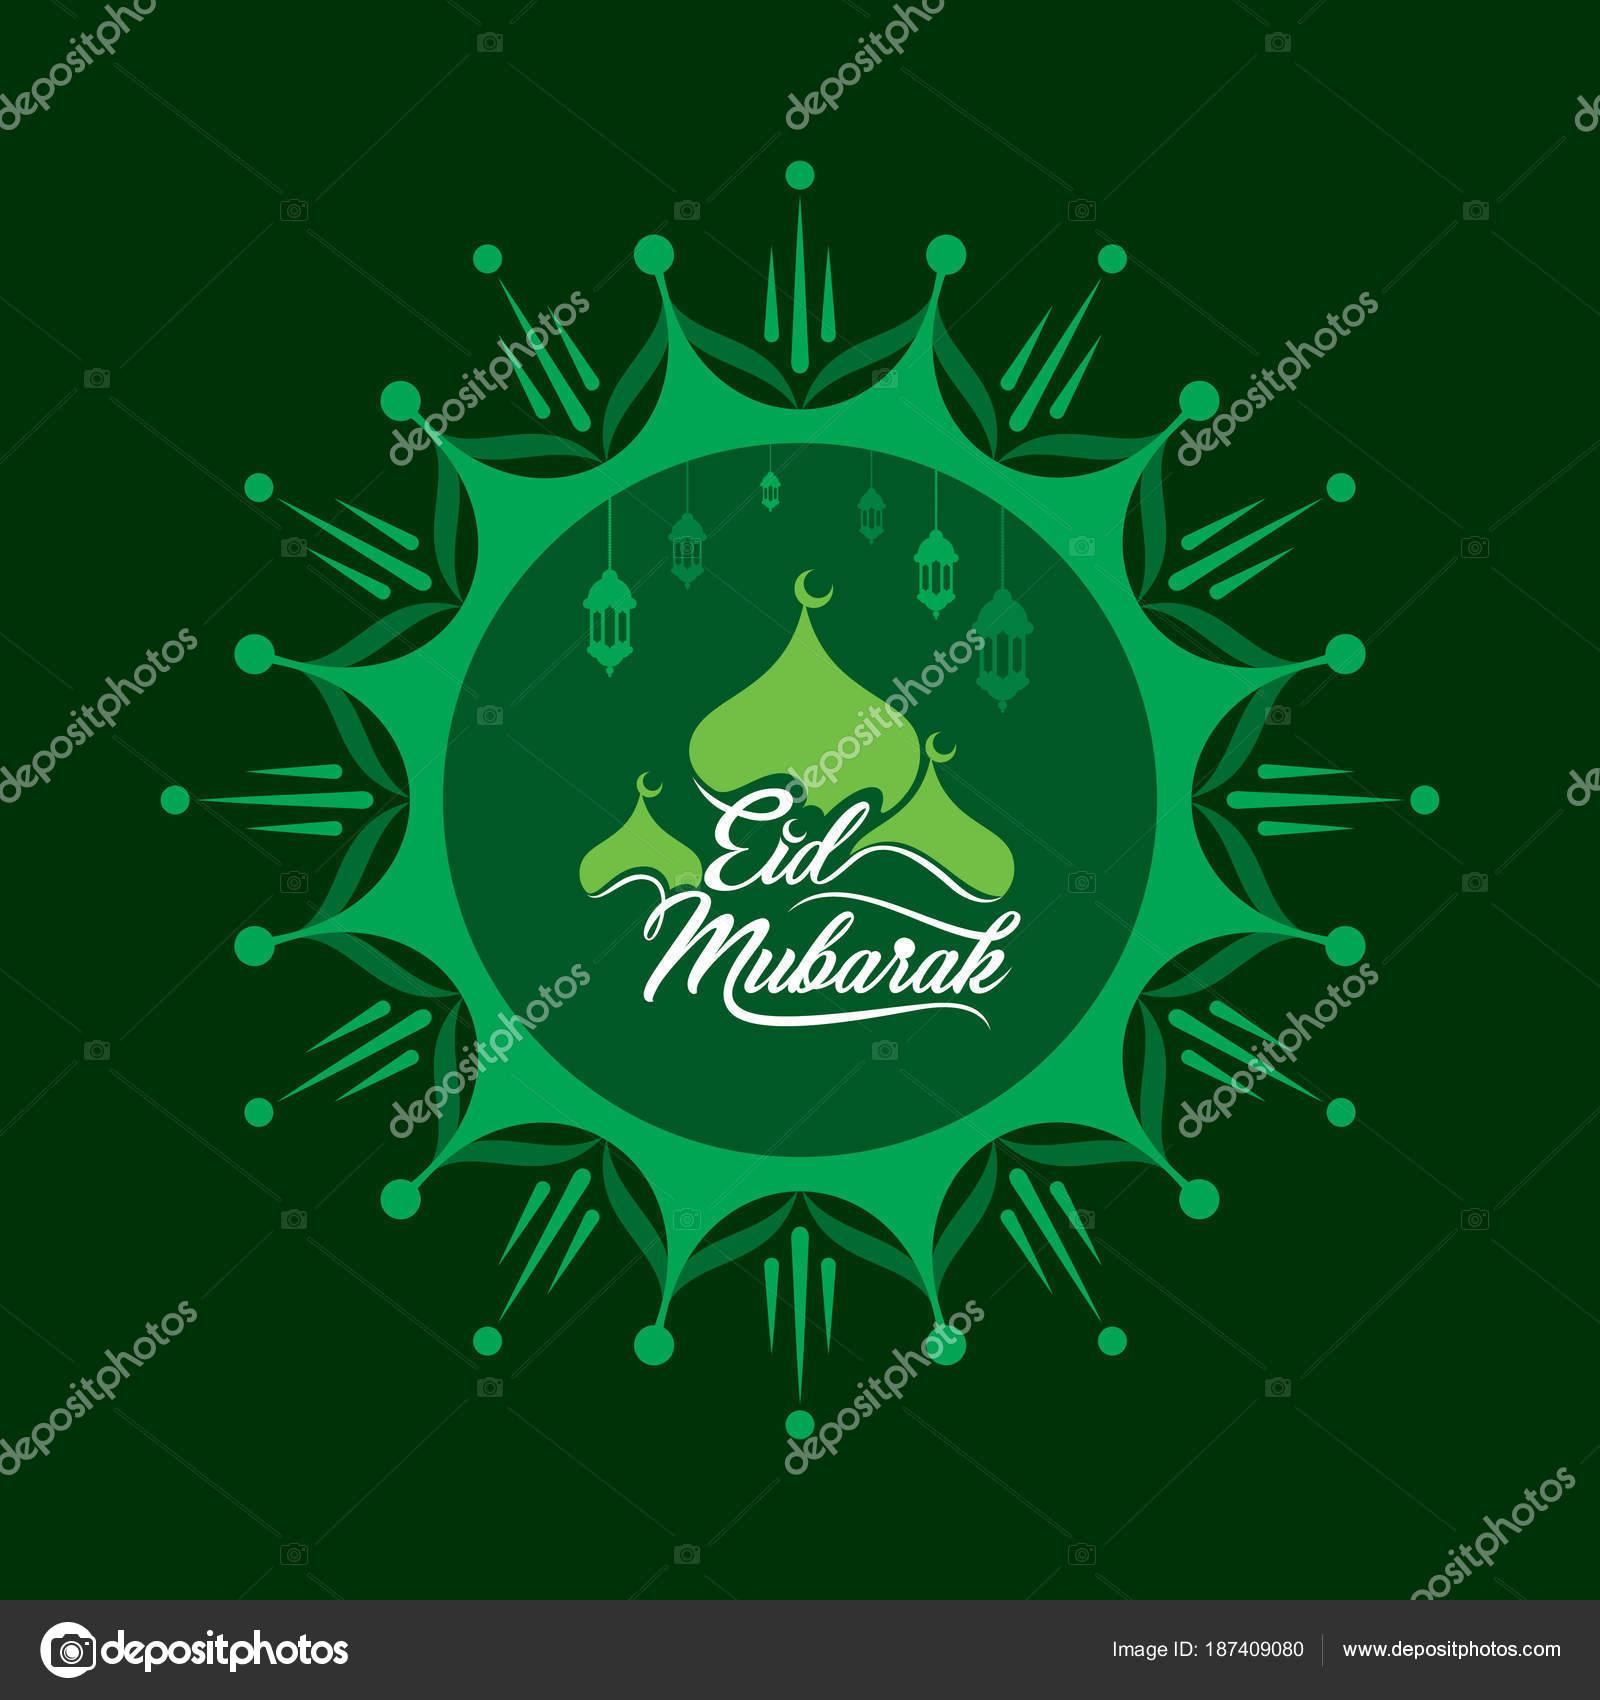 Happy eid mubarak greeting design stock vector vectotaart 187409080 happy eid mubarak greeting design stock vector kristyandbryce Choice Image